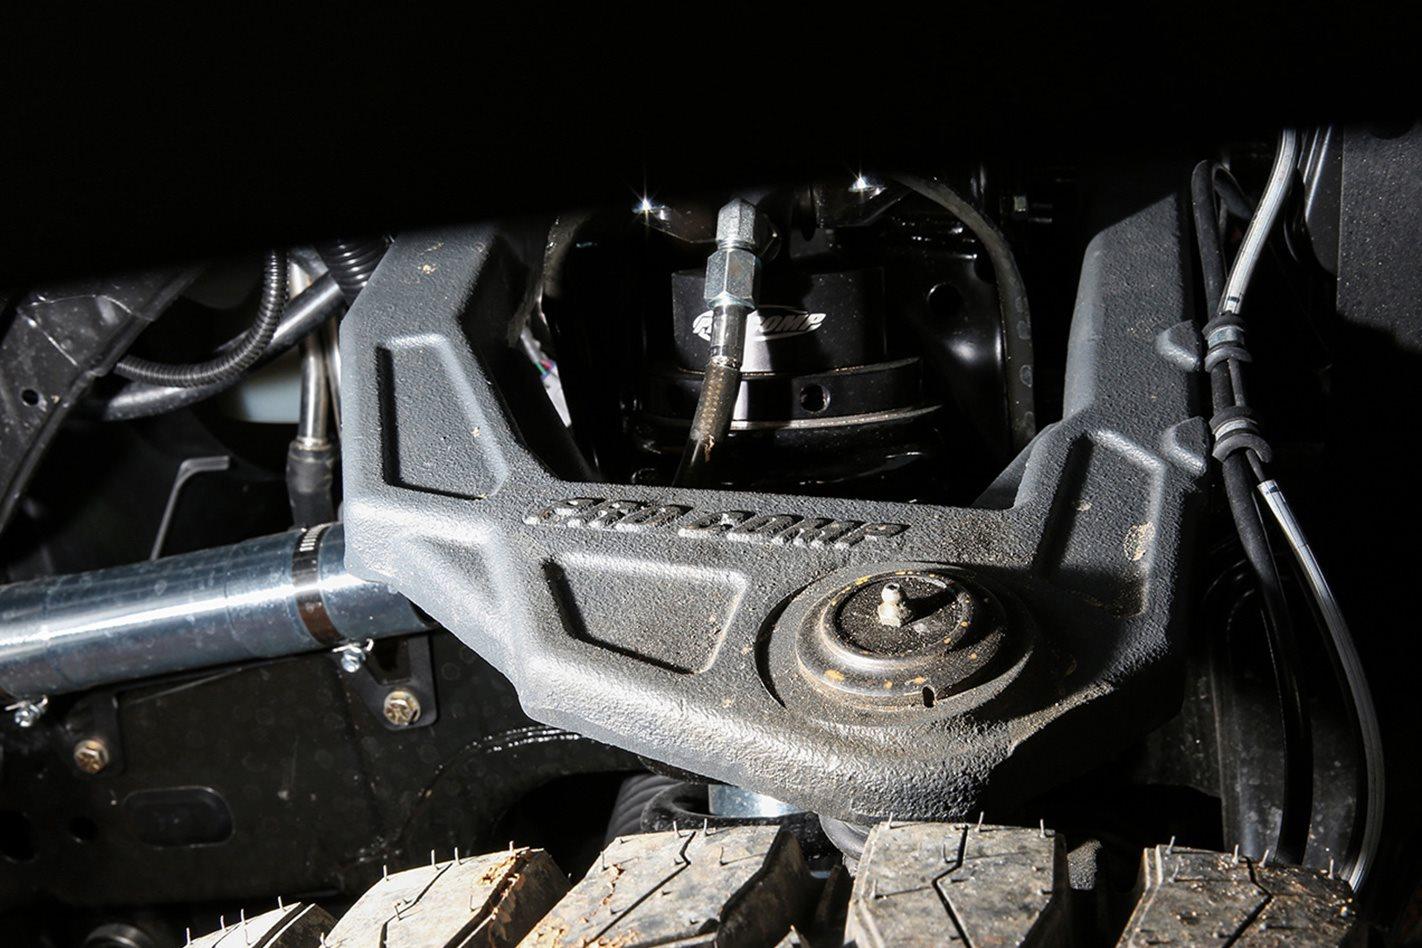 Custom Toyota Tundra Pro Comps' bypass system